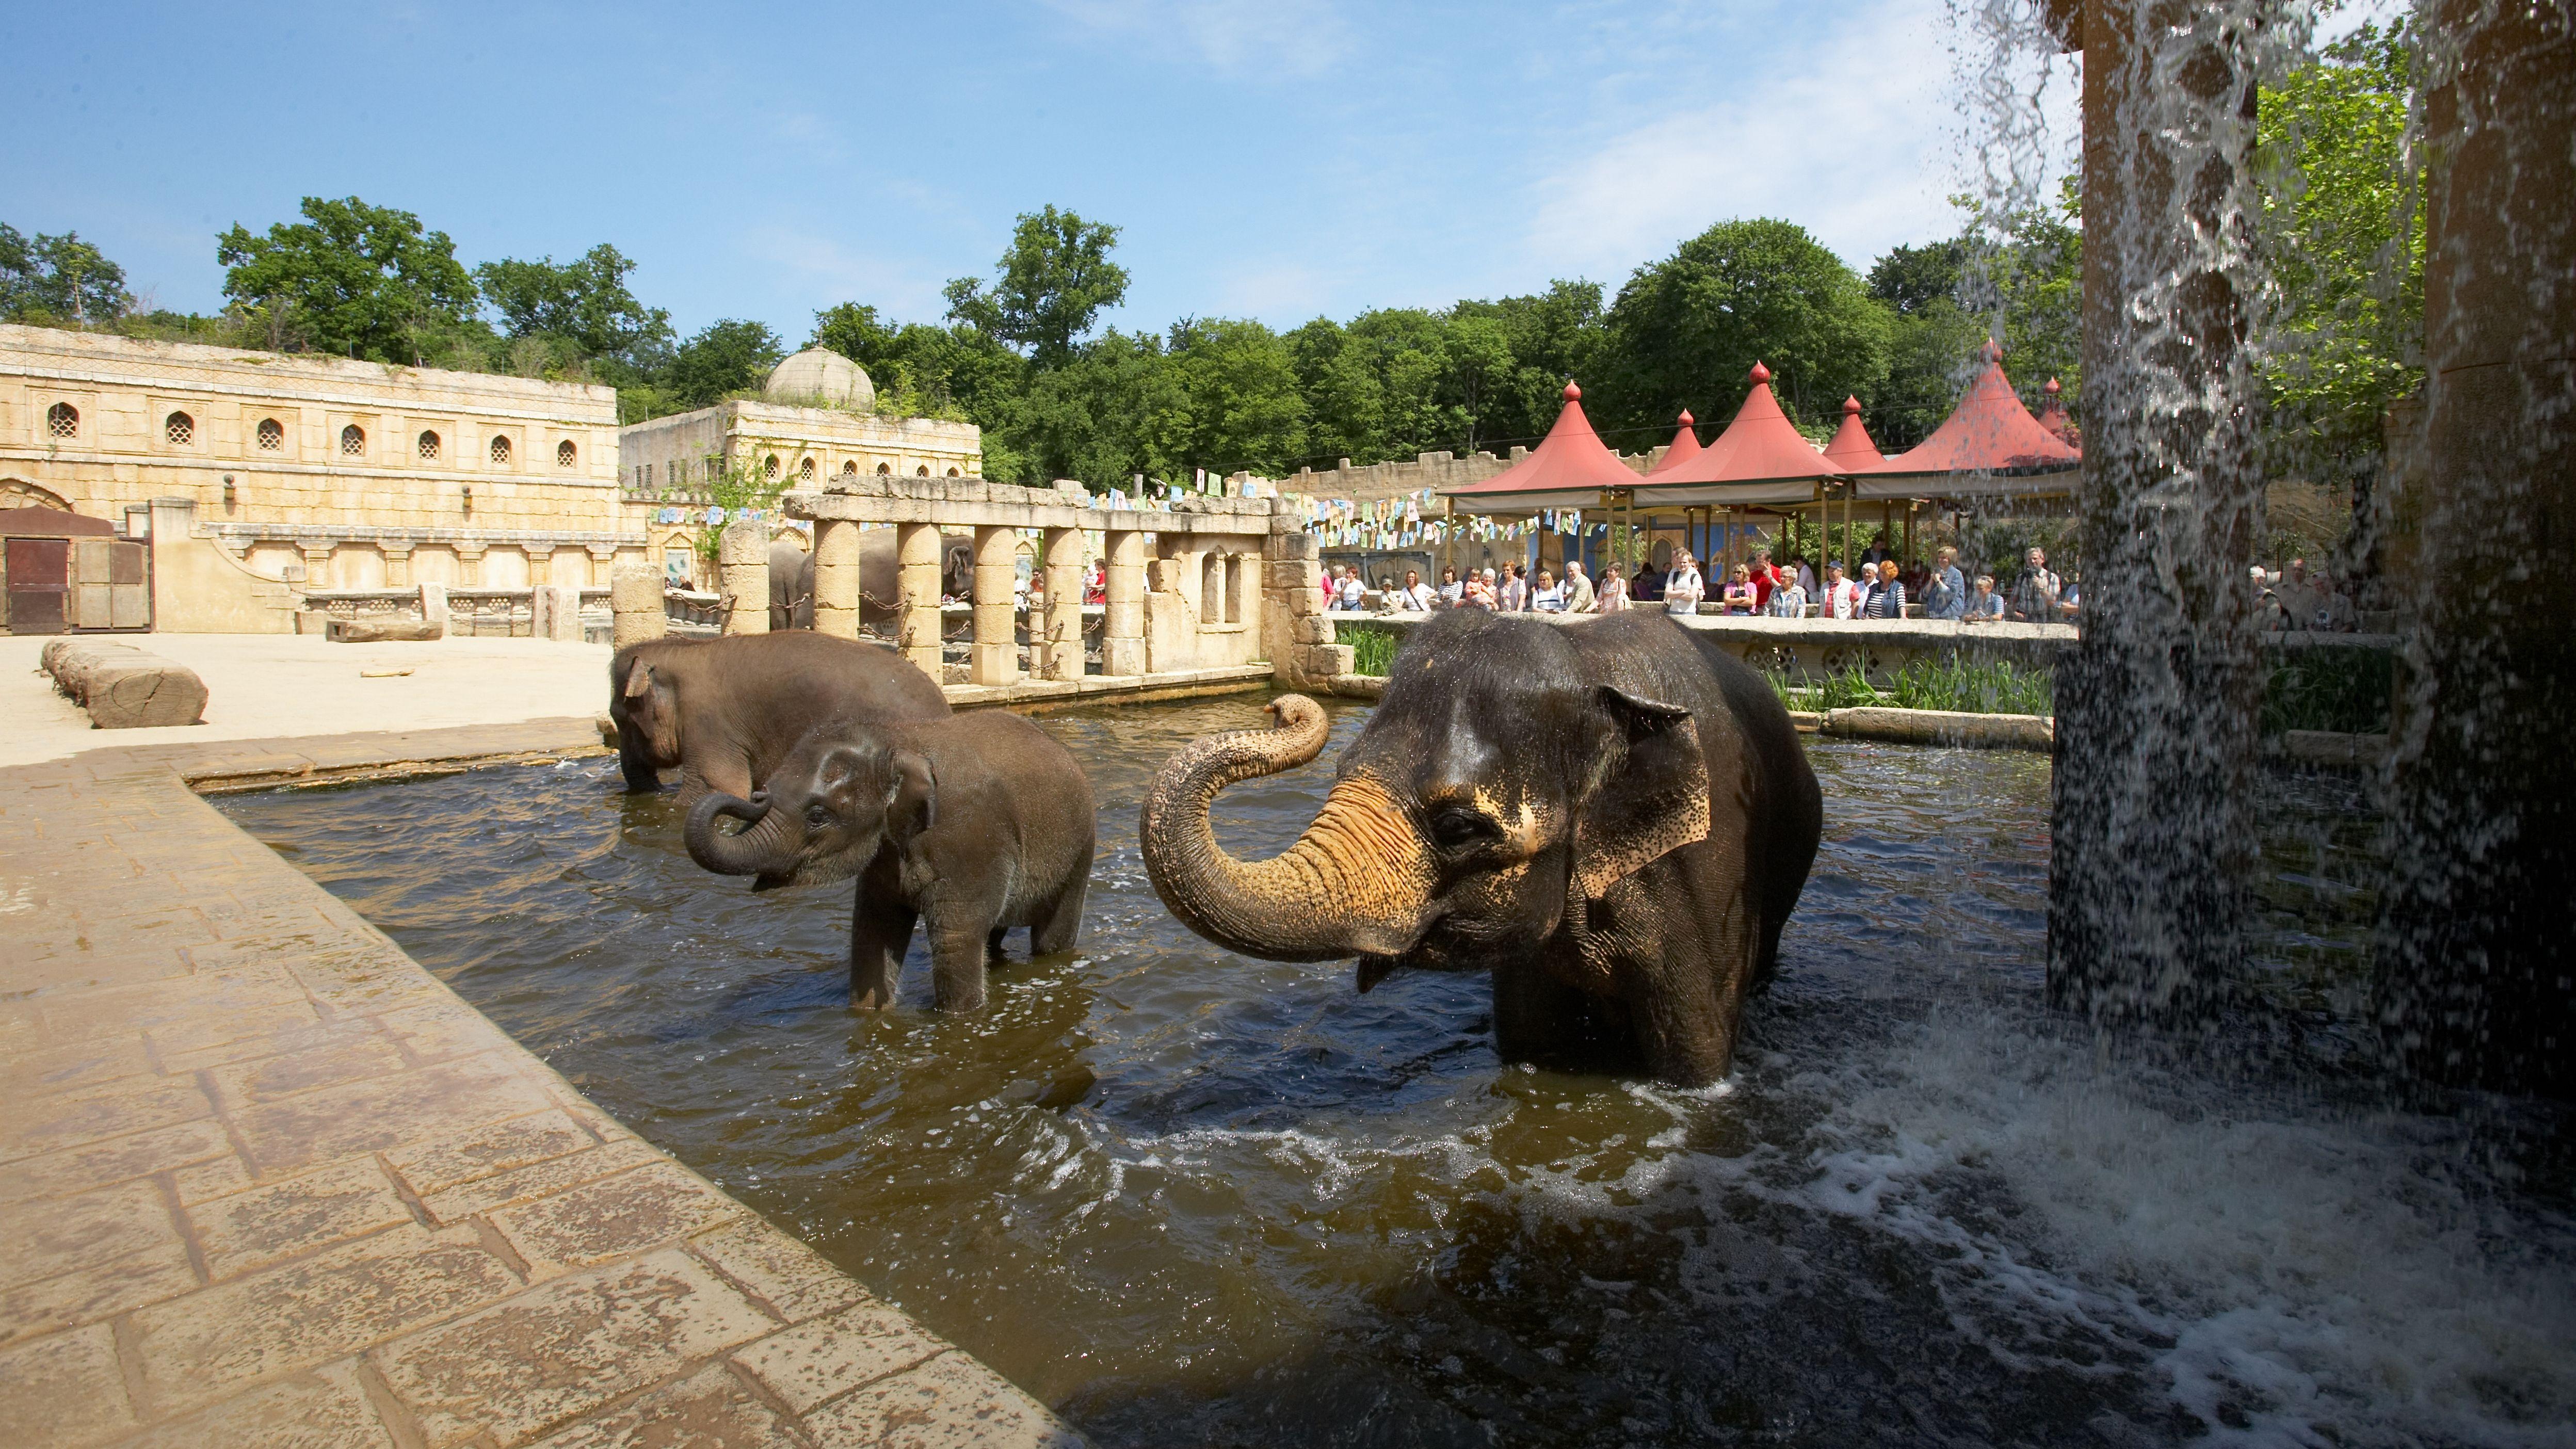 erlebnis-zoo-hannover-elefanten-baden-a